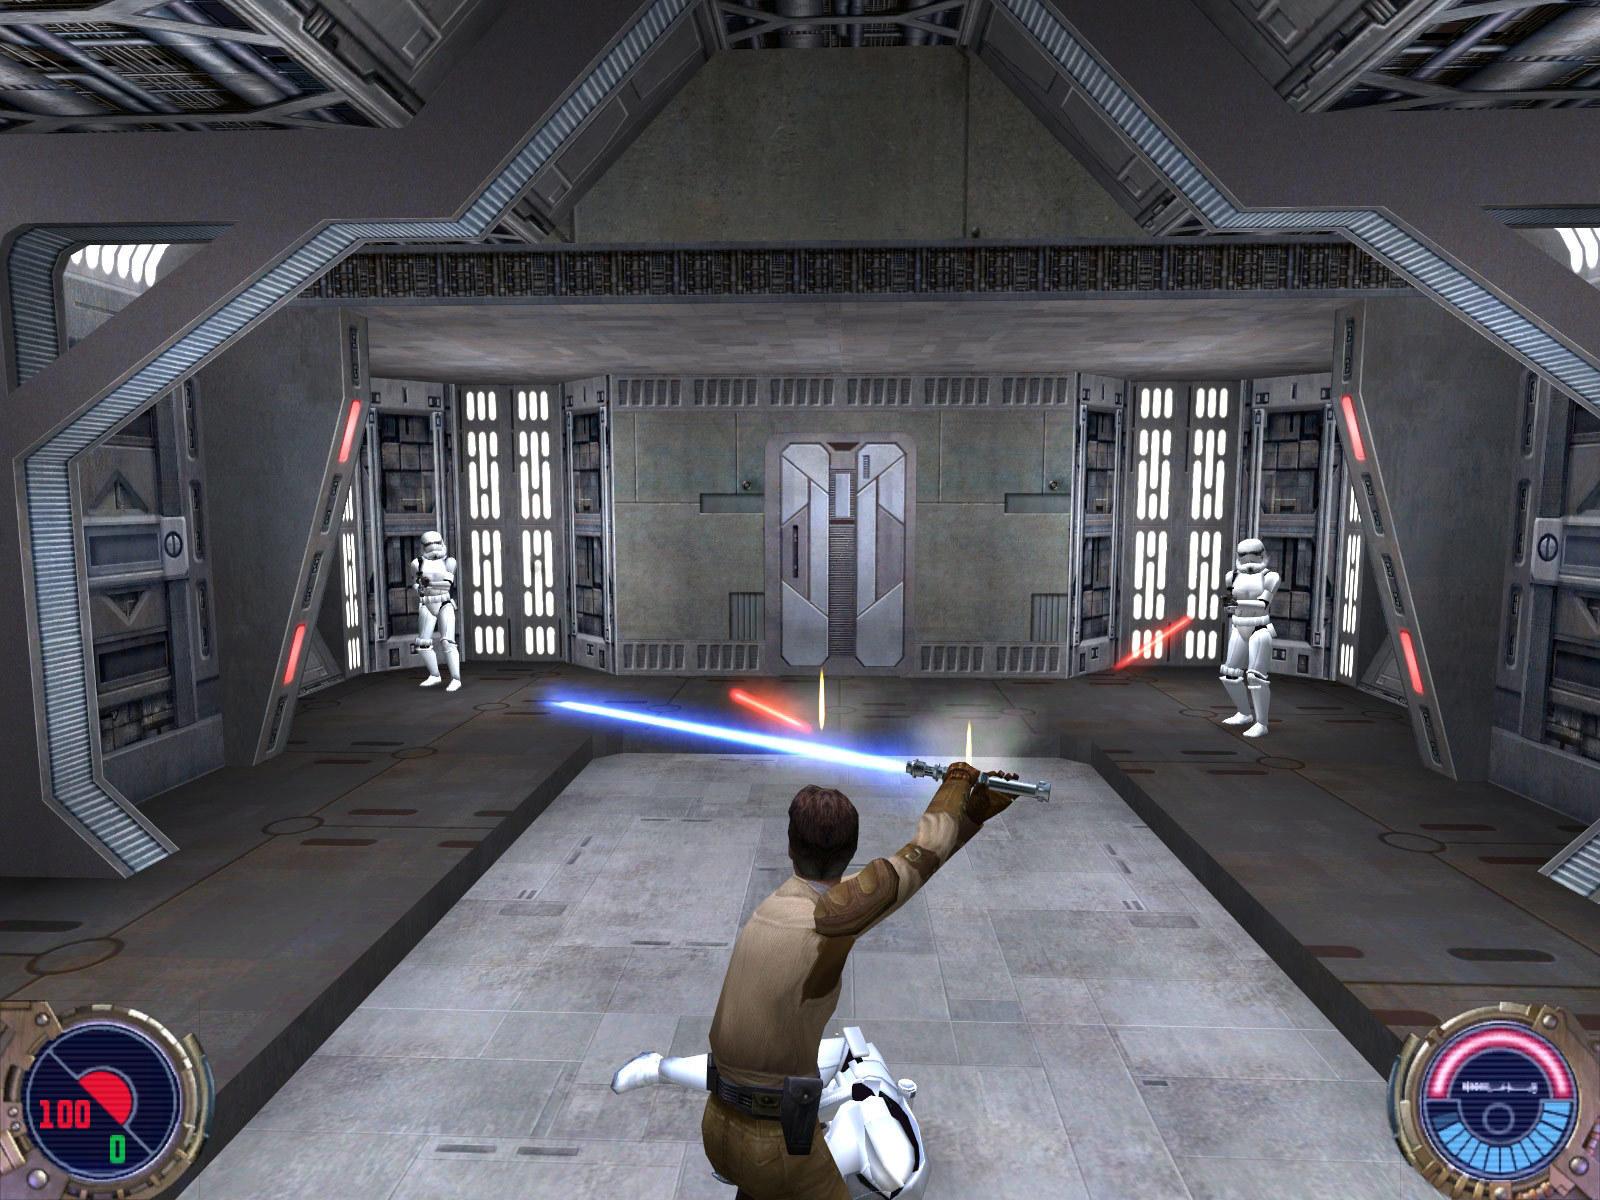 star wars games - HD1200×900